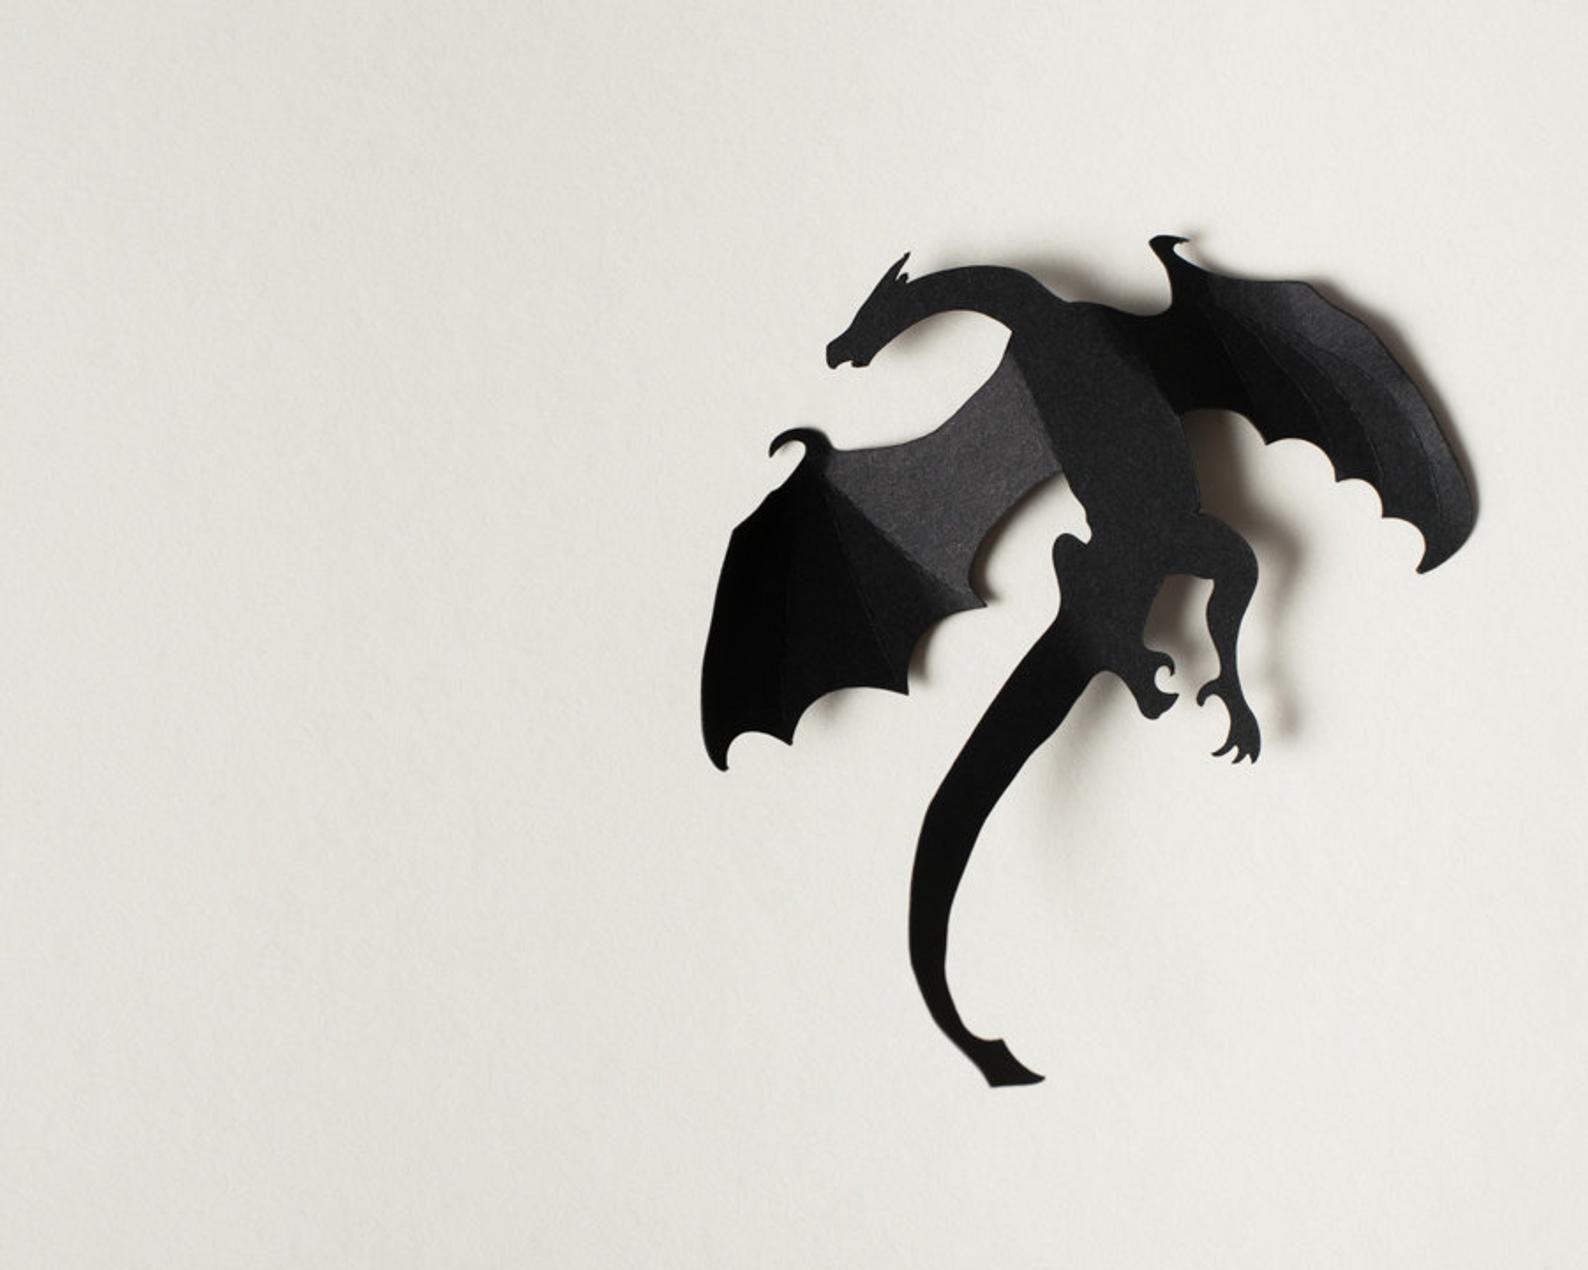 Dragon Mythology Handmade Metal Wall Accent Art Decor